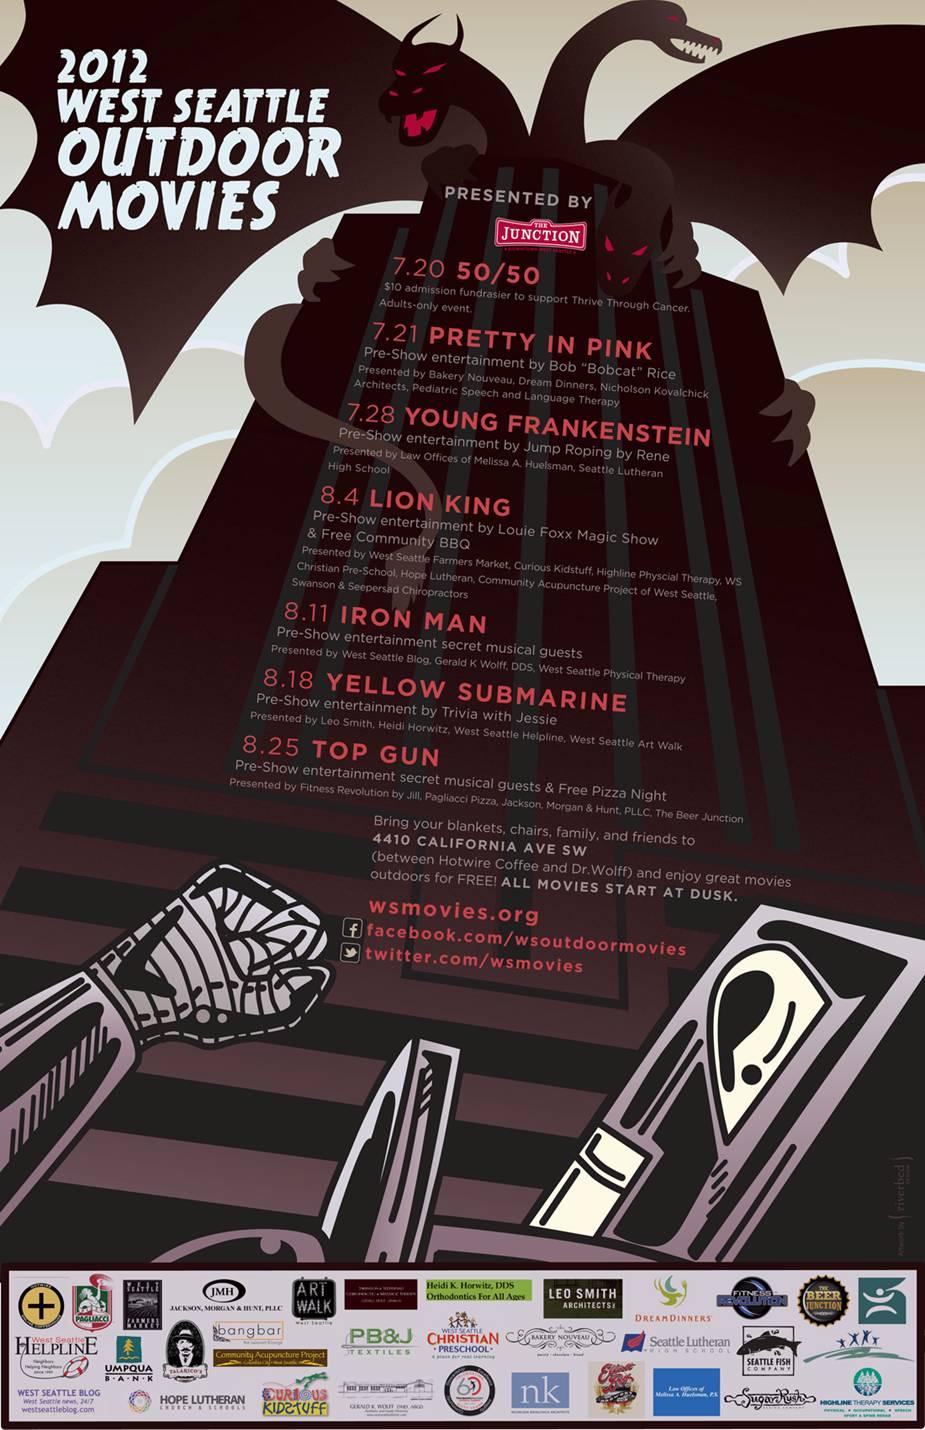 West Seattle Outdoor Movies   2012 Schedule: <em>Young Frankenstein</em>, <em>Yellow Submarine</em>, <em>Iron Man</em>, & More